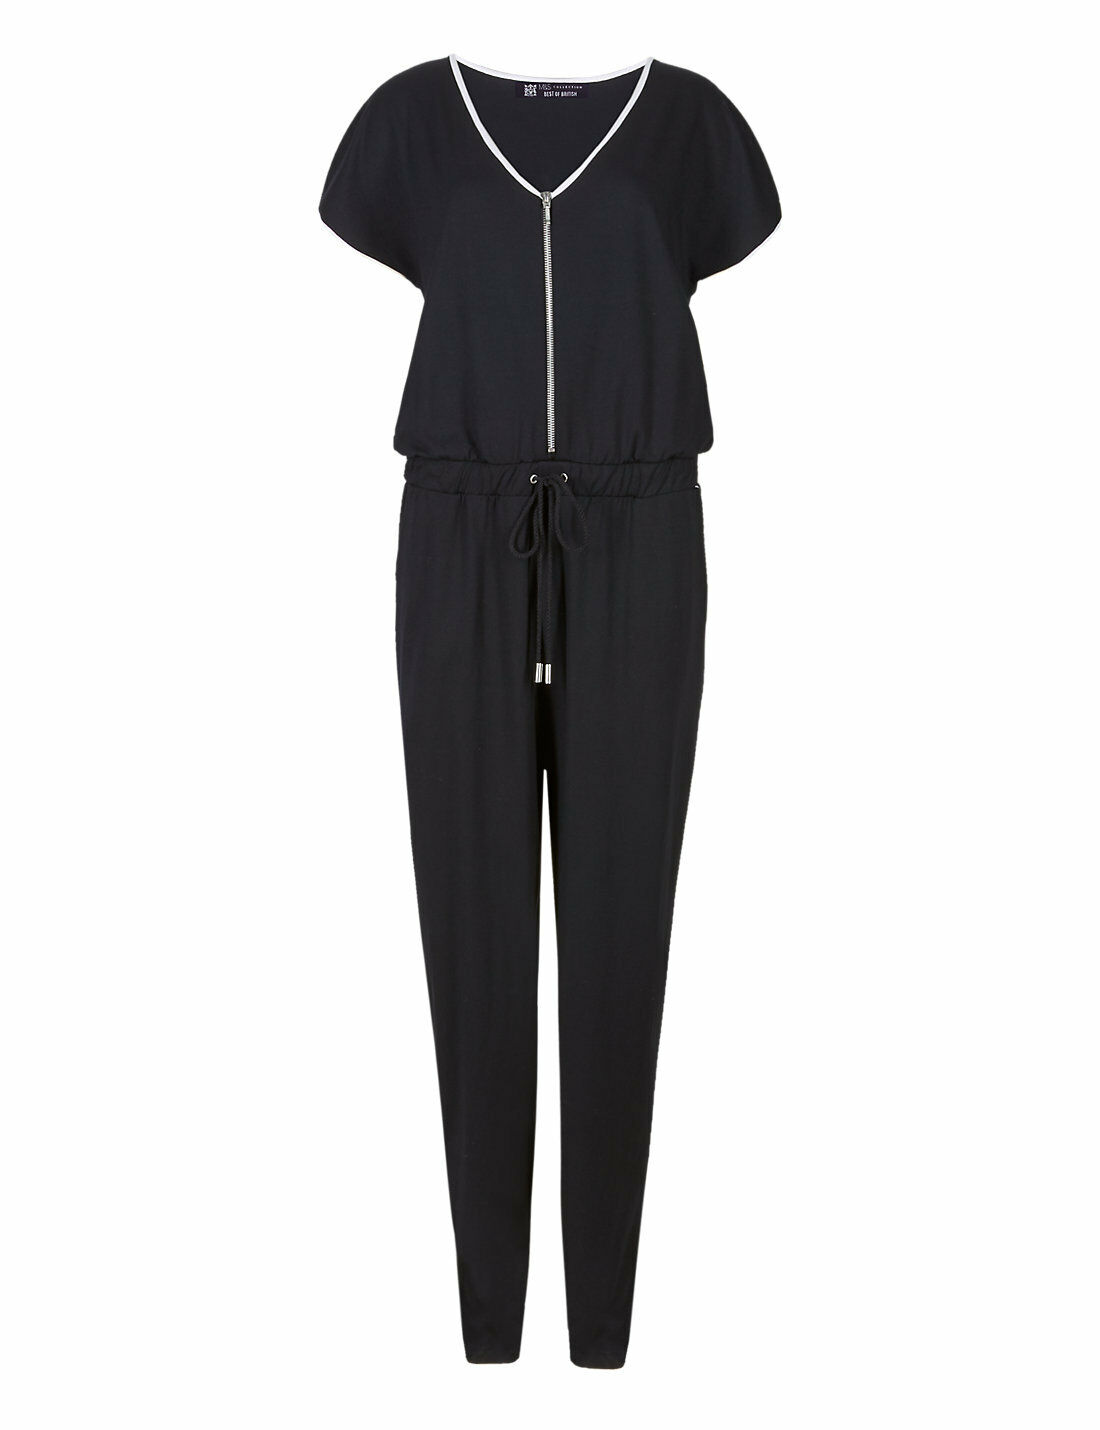 New M&S Best Of British Monochrome Zipped Jumpsuit Sz